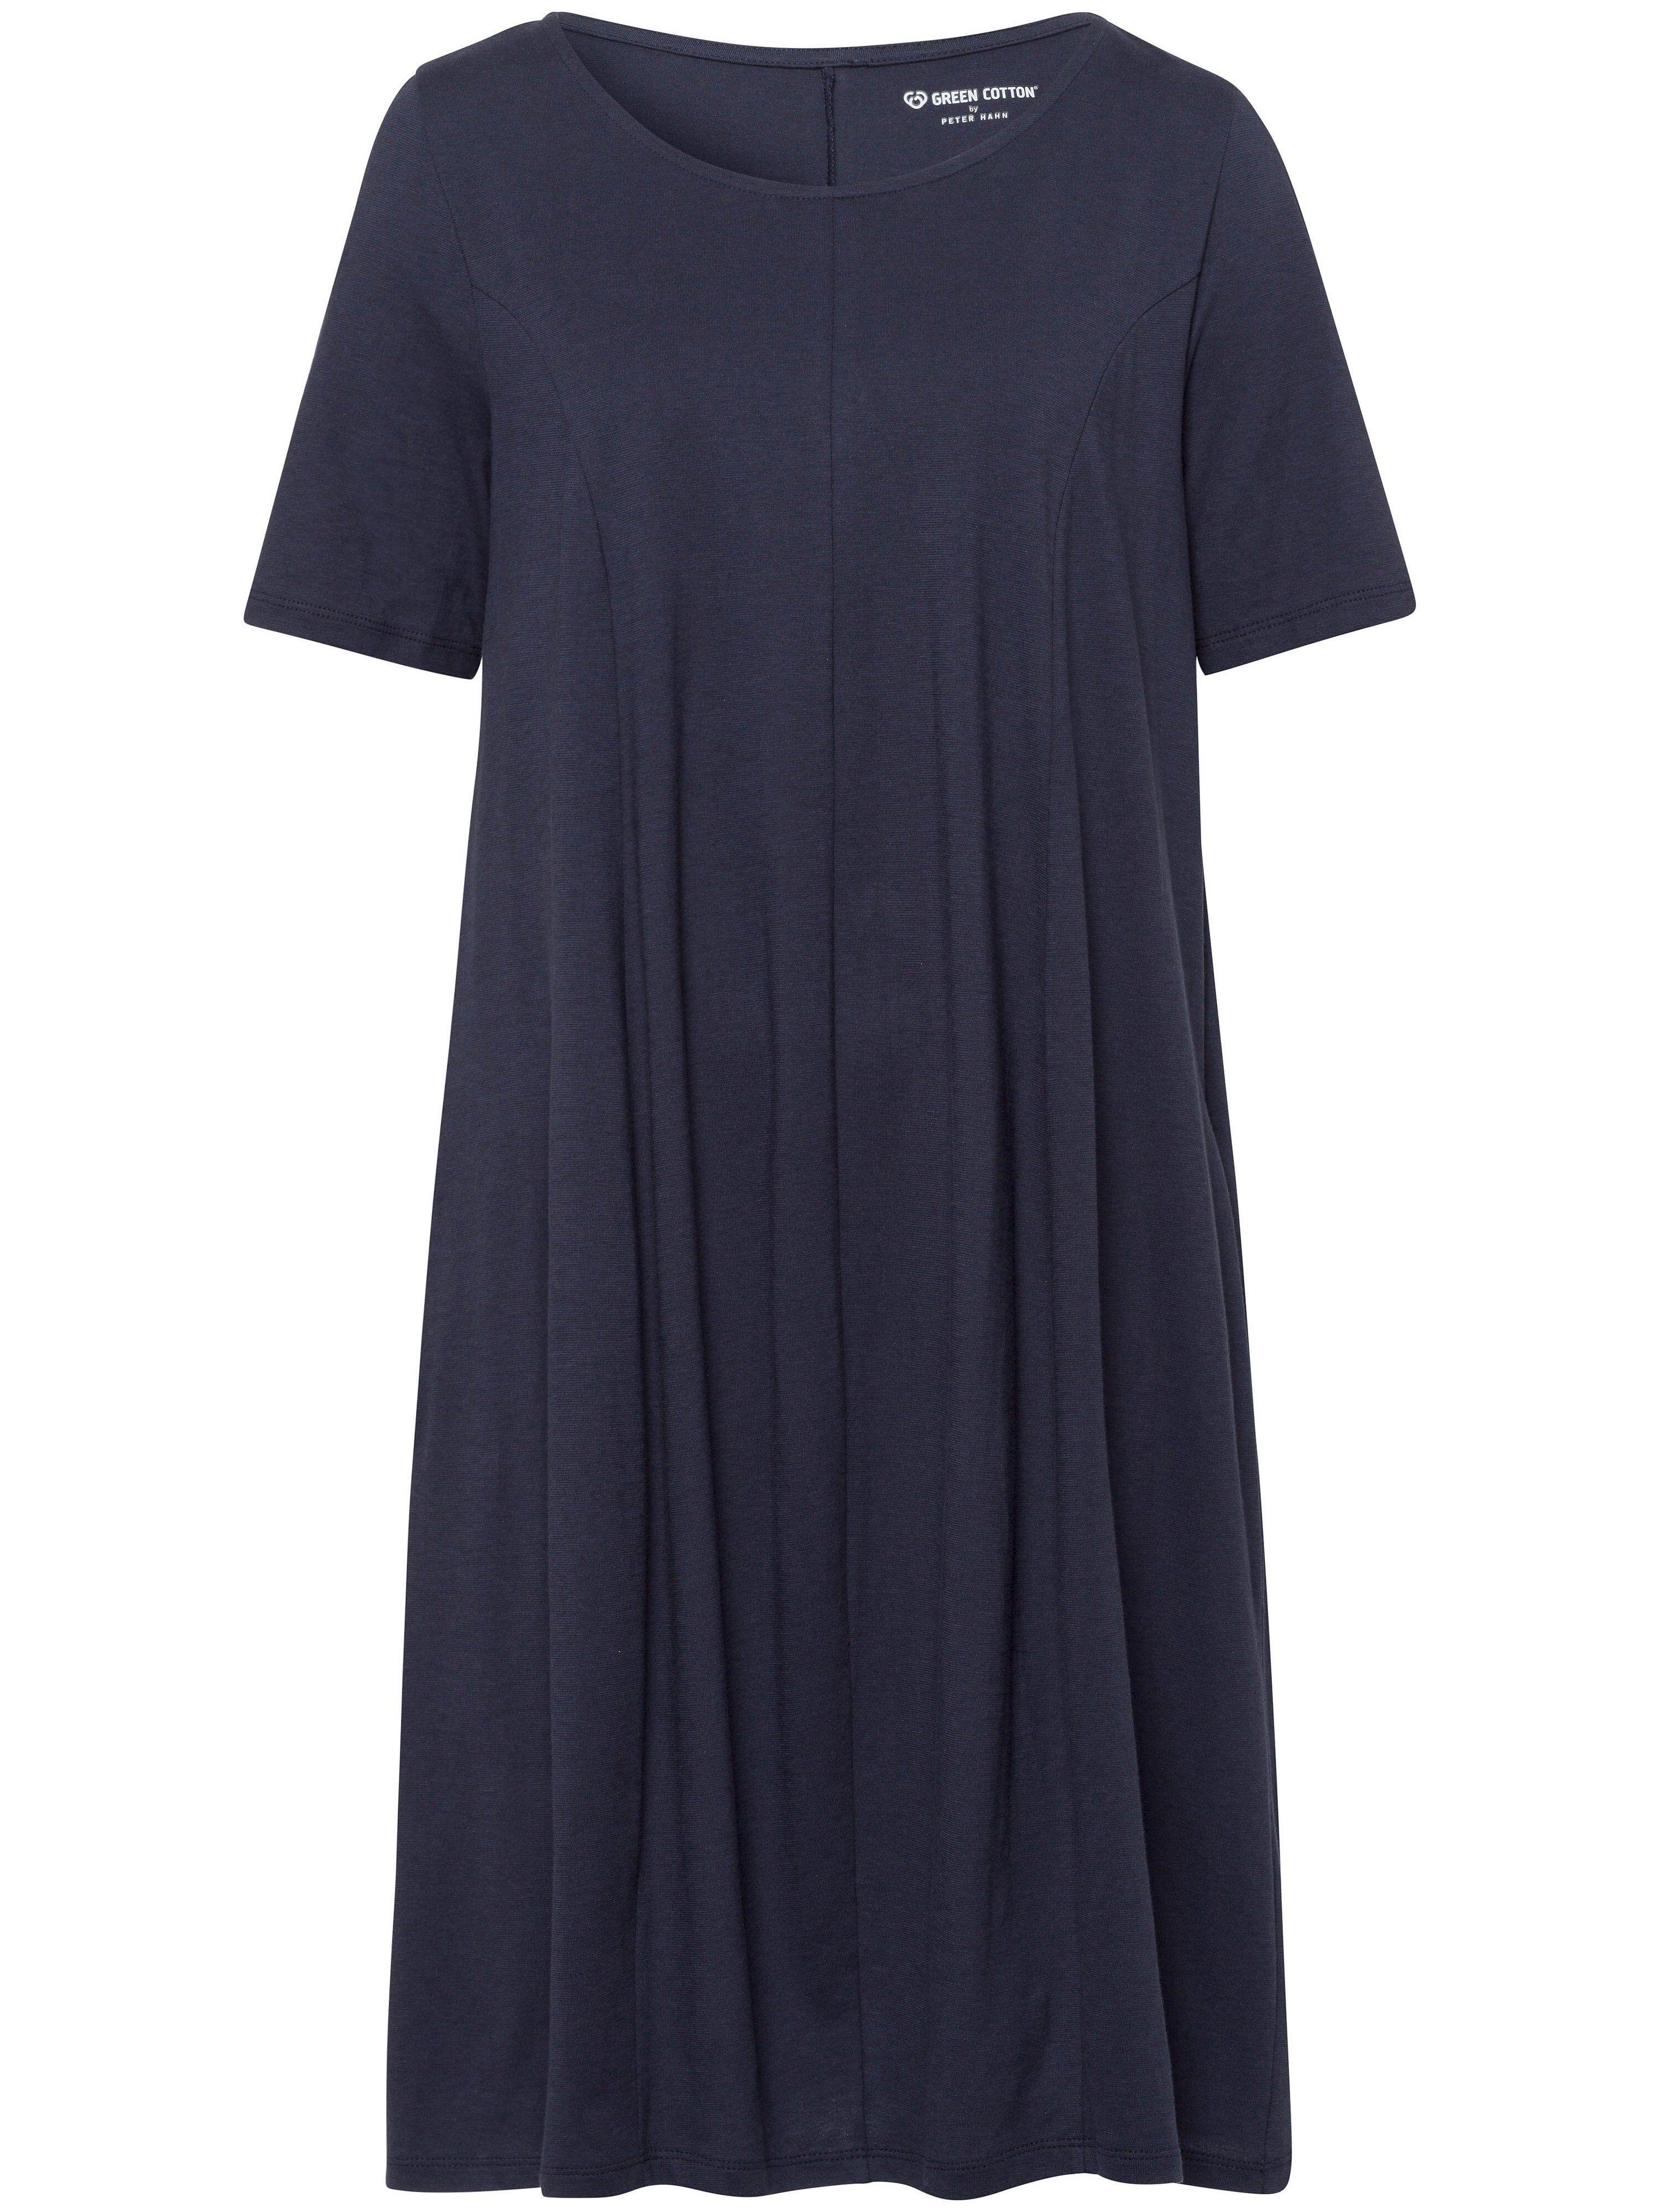 Green Cotton La robe 100% coton ligne en O  Green Cotton bleu  - Femme - 38